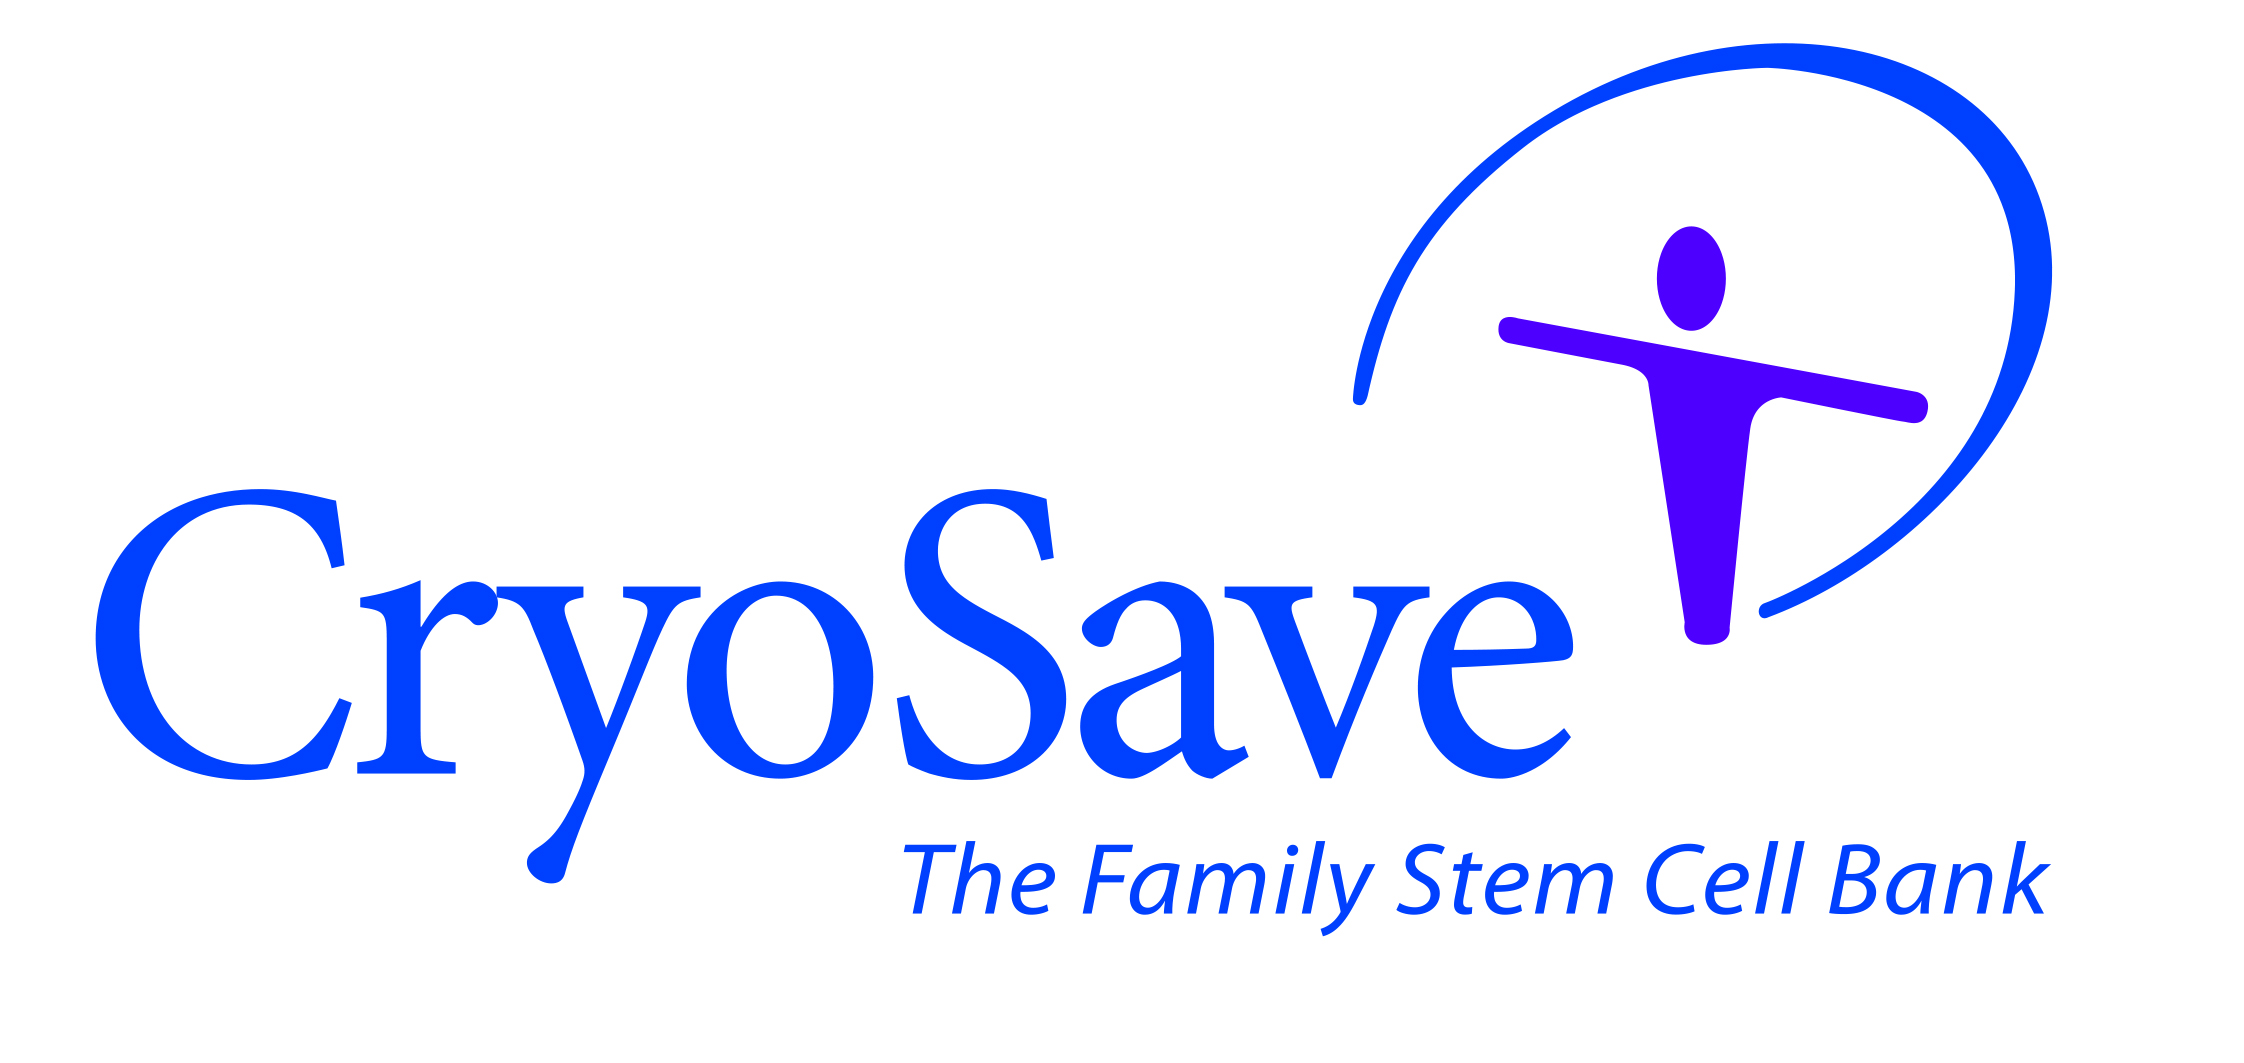 cryosave